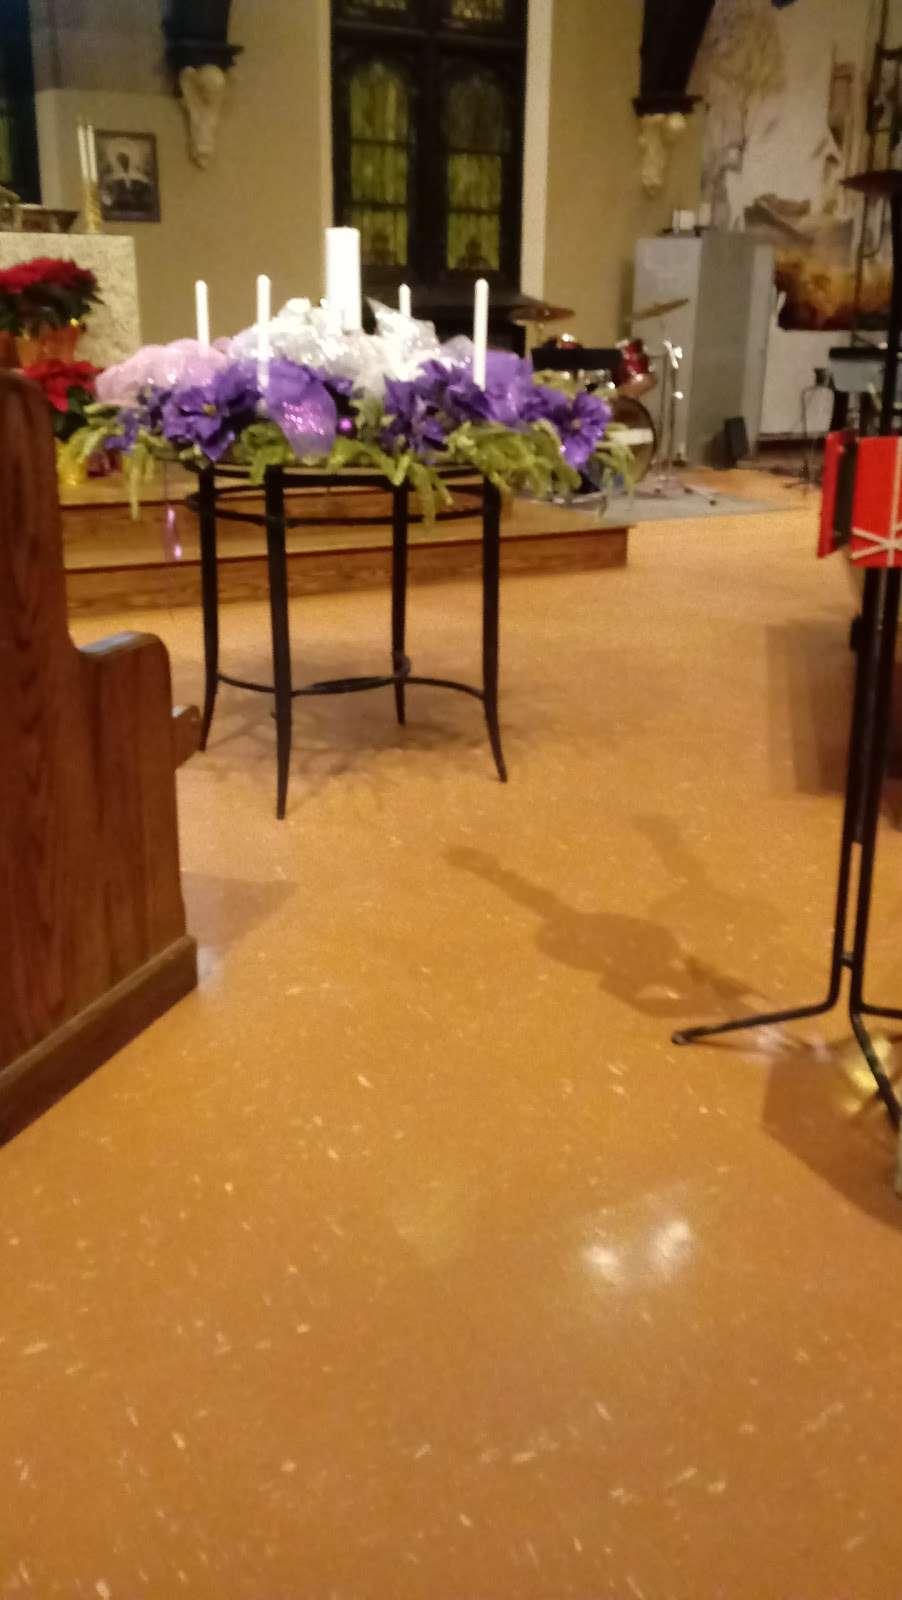 All Peoples Church - church  | Photo 9 of 10 | Address: 2600 N 2nd St, Milwaukee, WI 53212, USA | Phone: (414) 264-1616